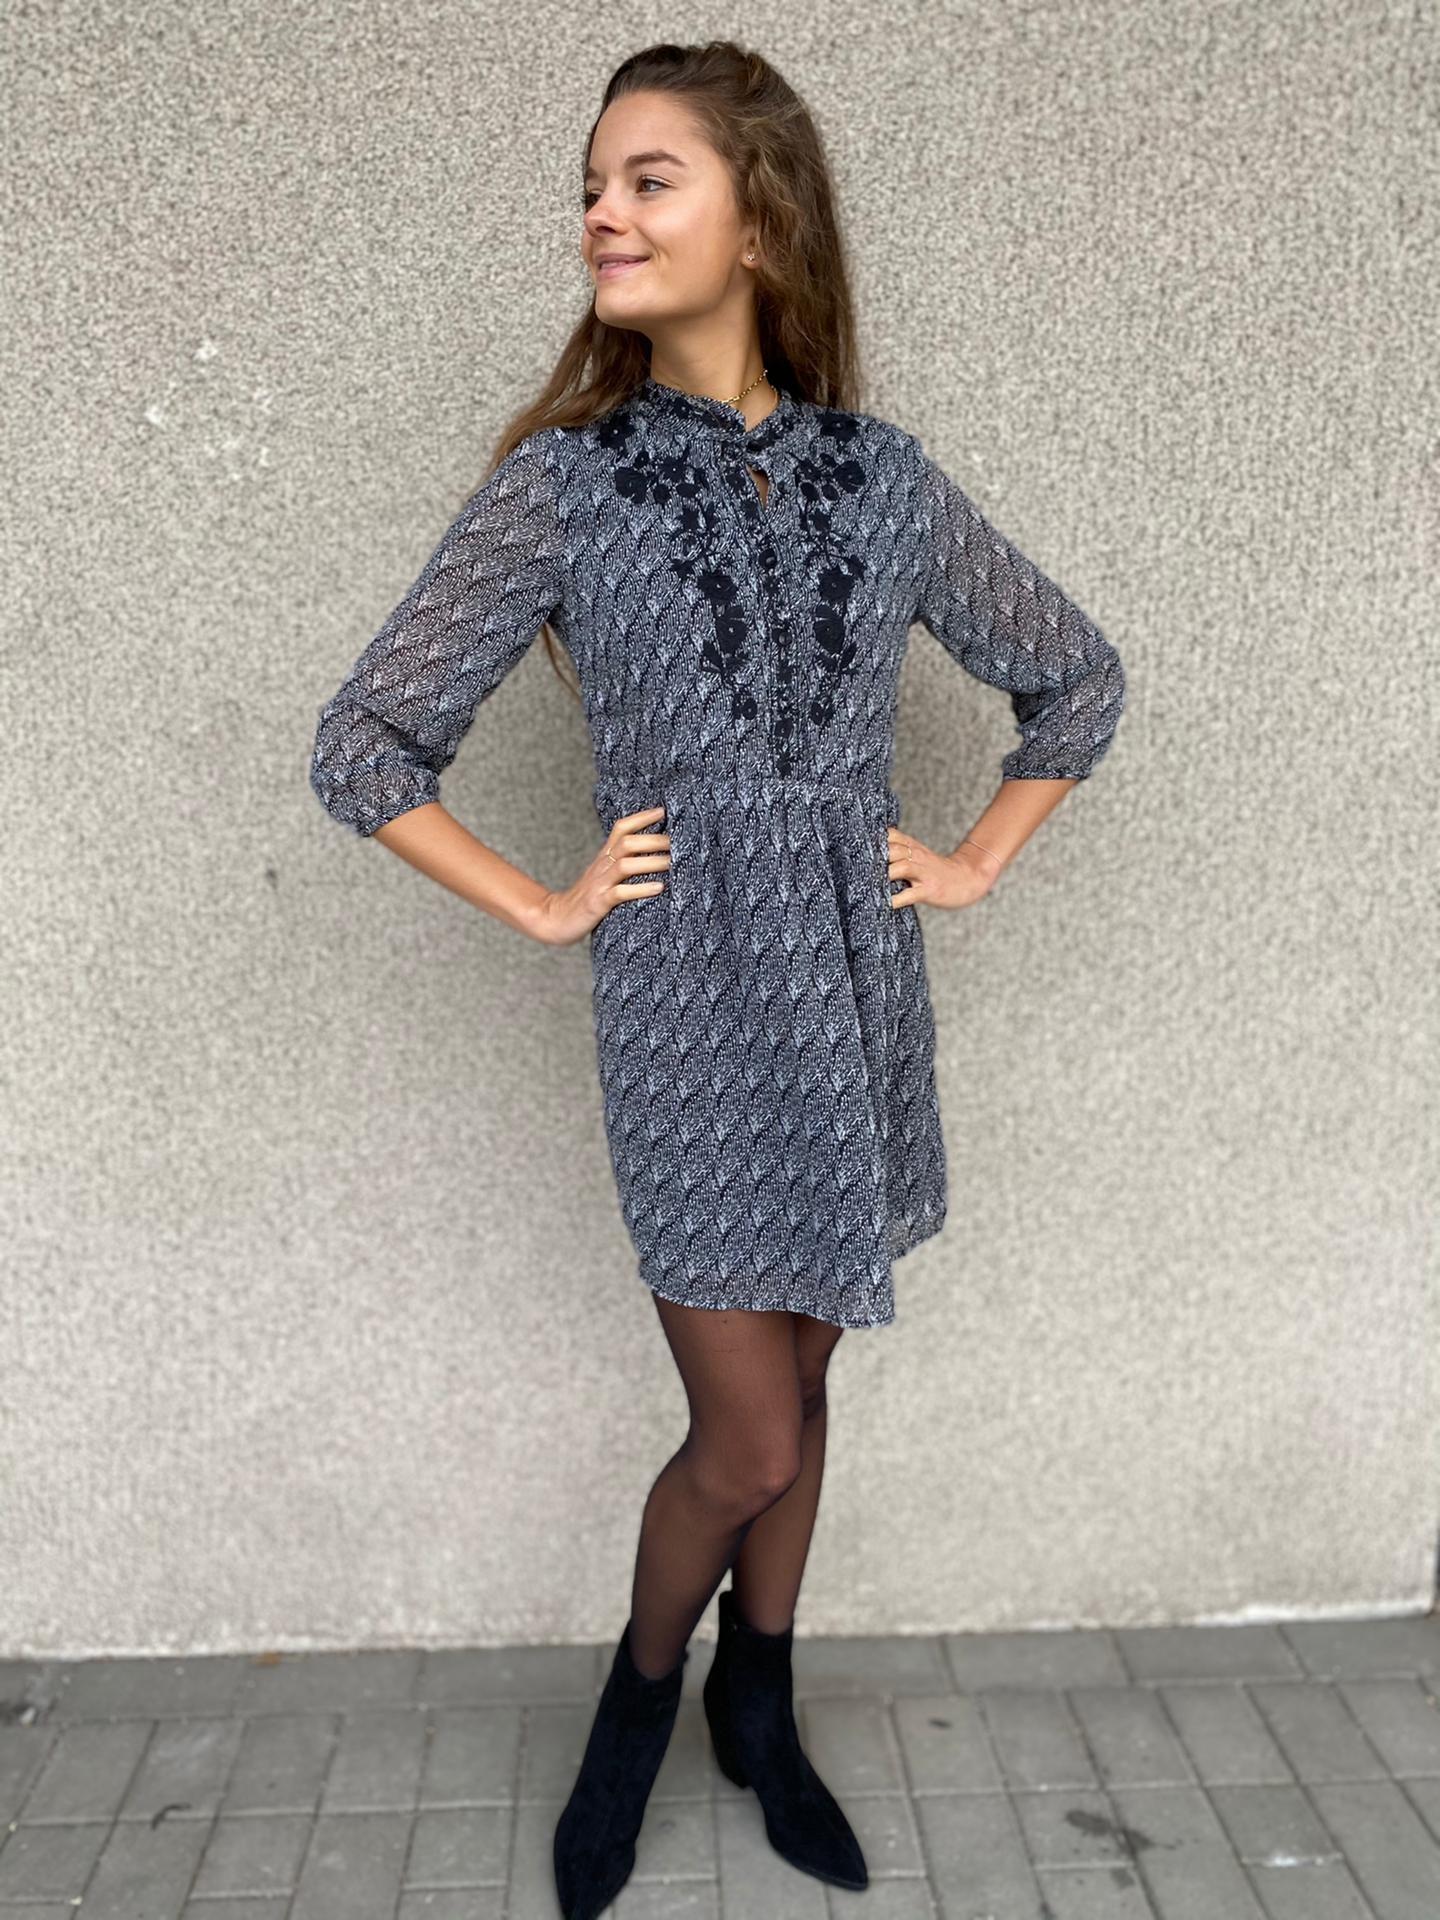 PEPITES robe cindy noir-1